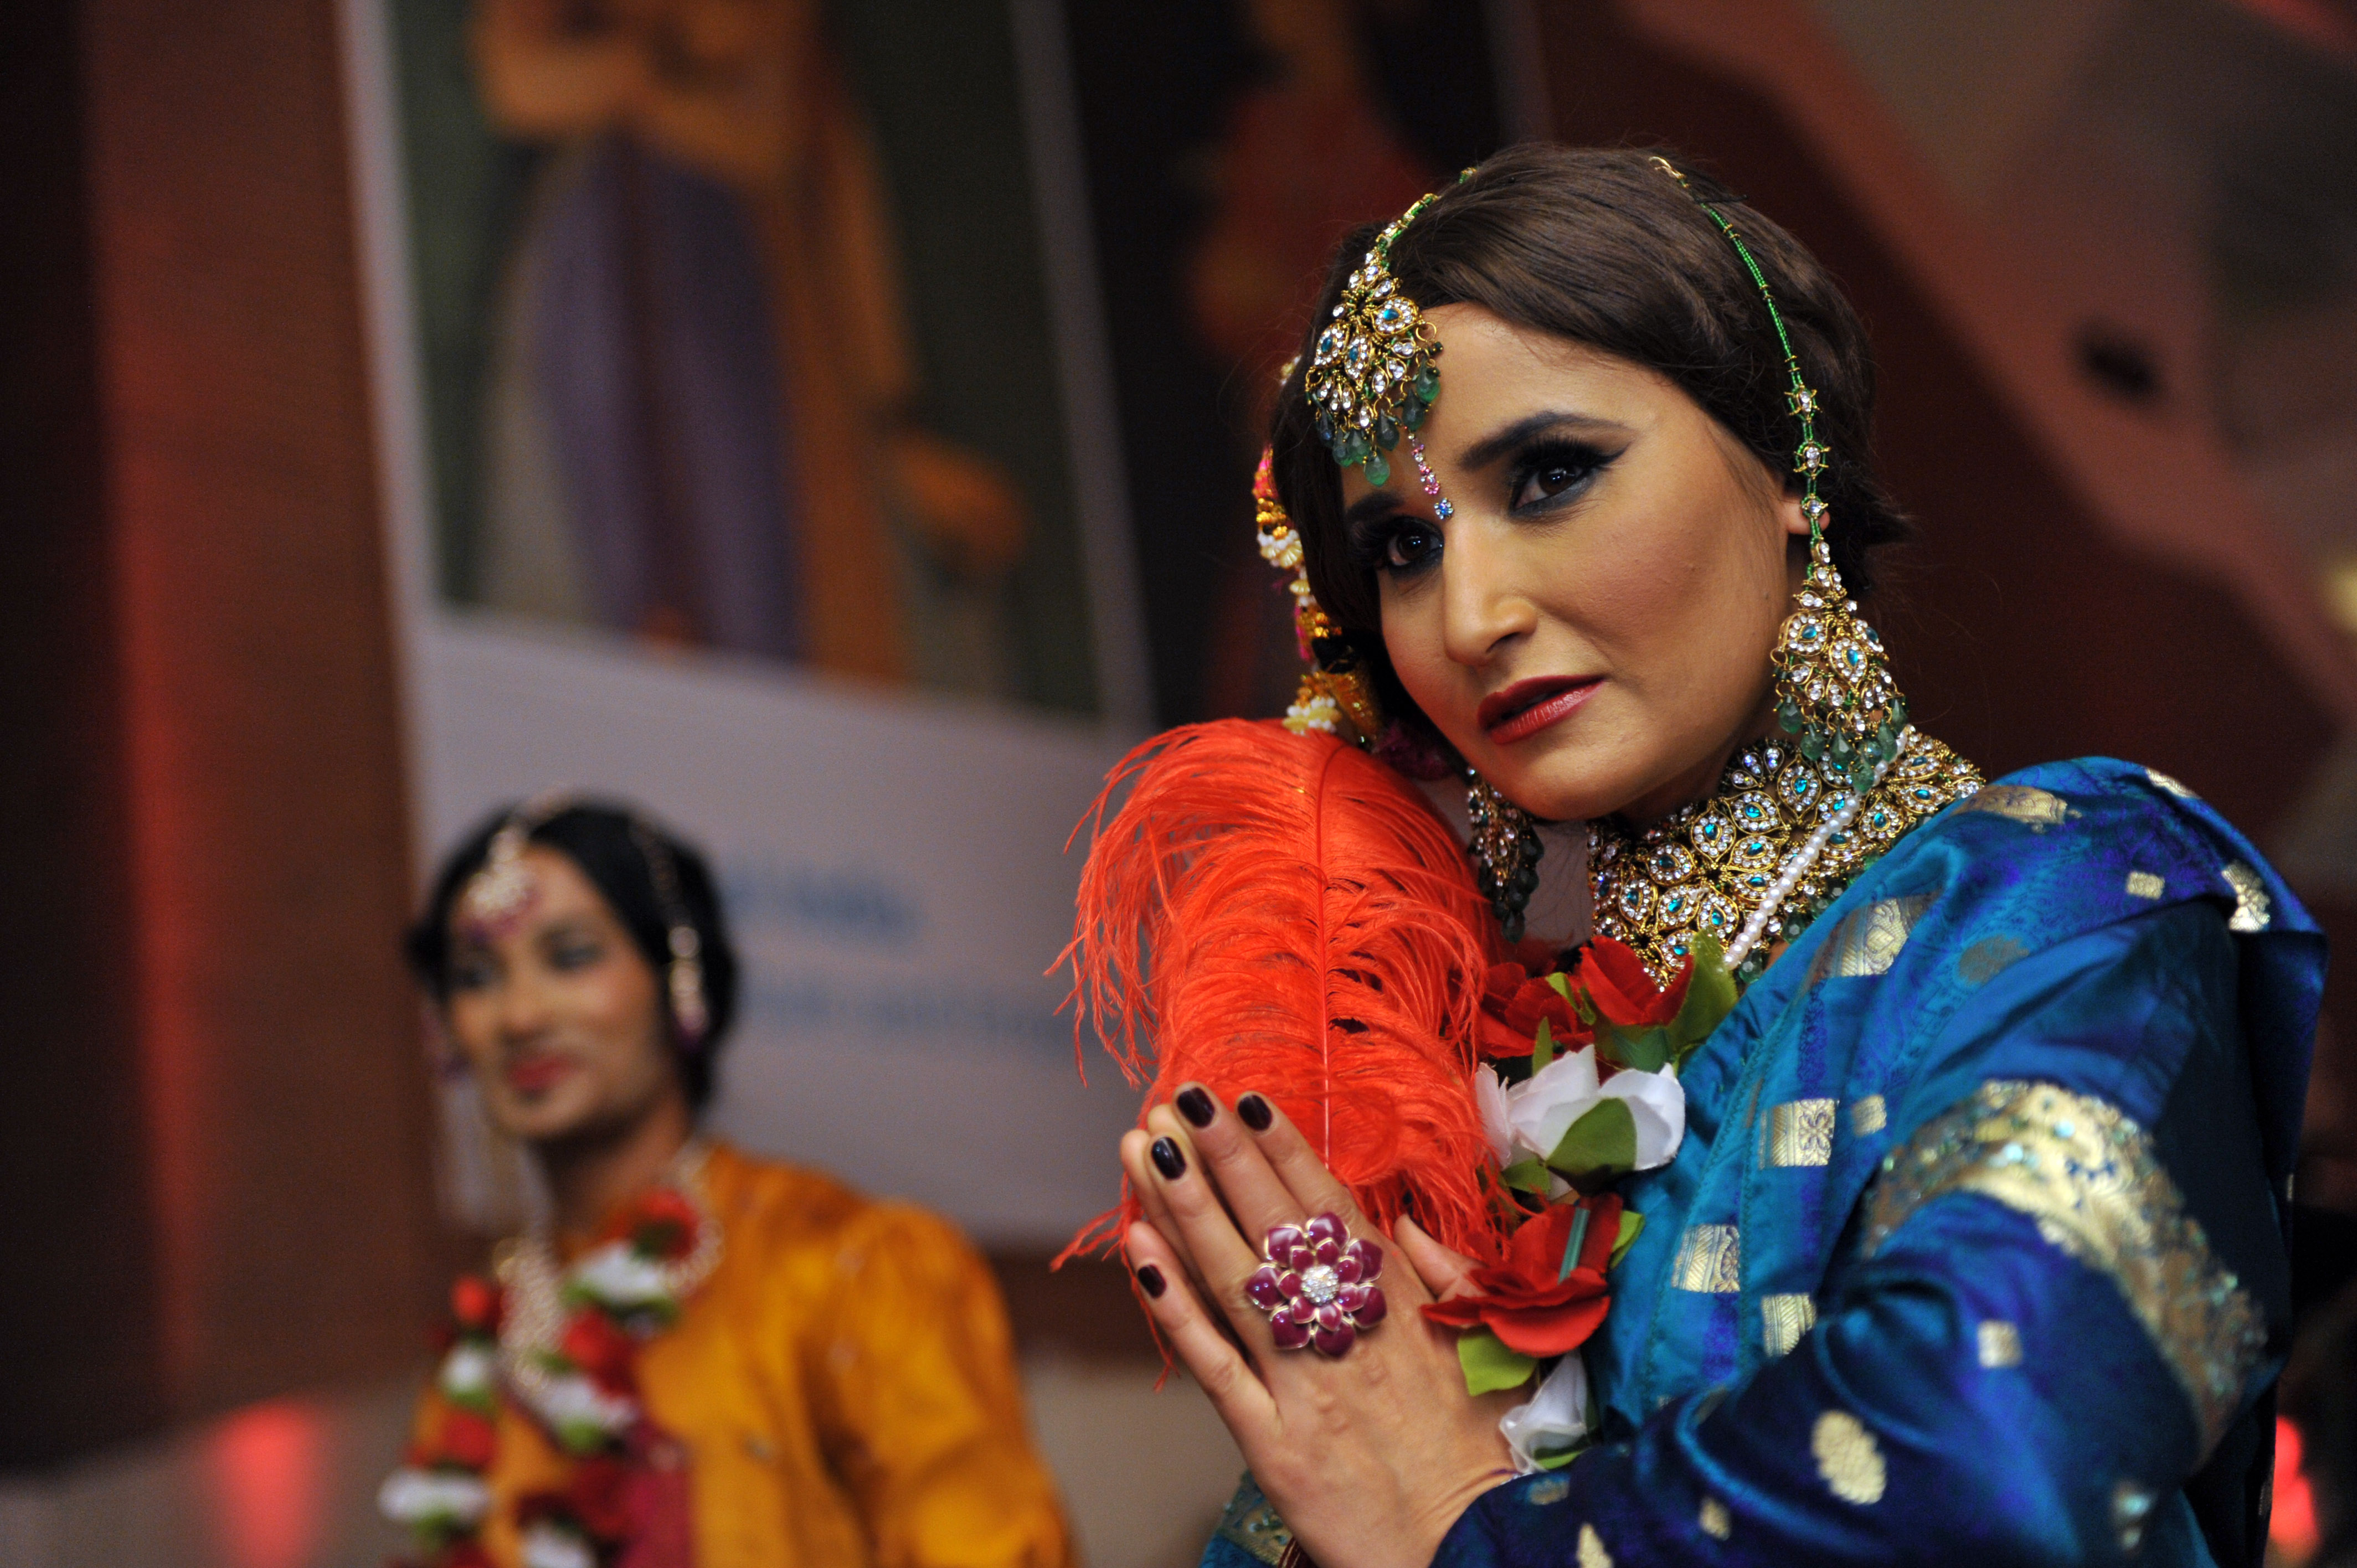 Image from Mughal Nites